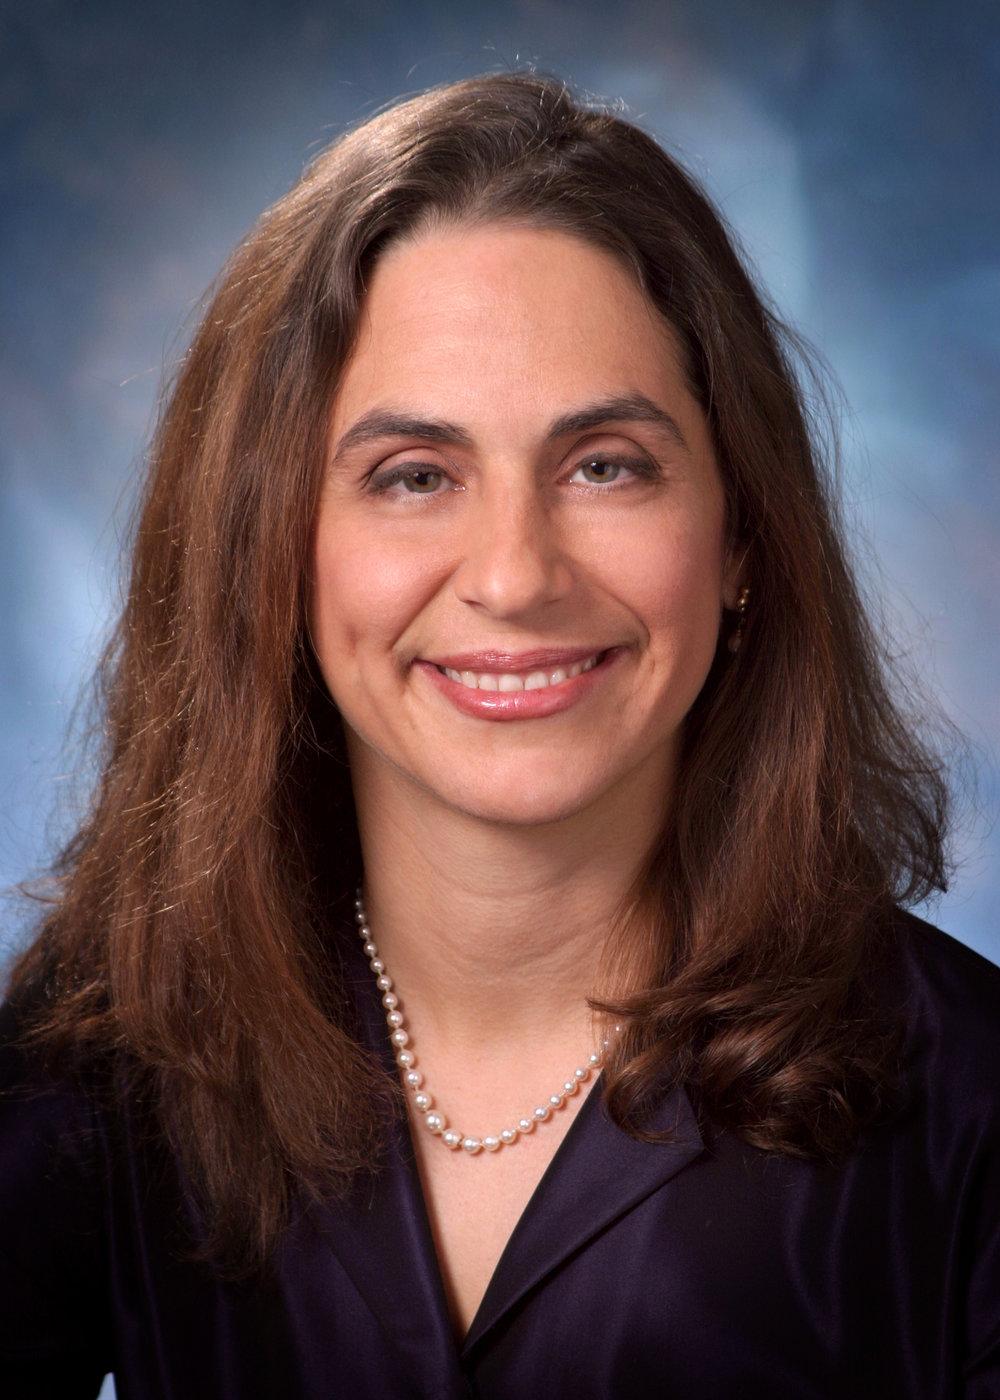 Ms. Nina Preuss